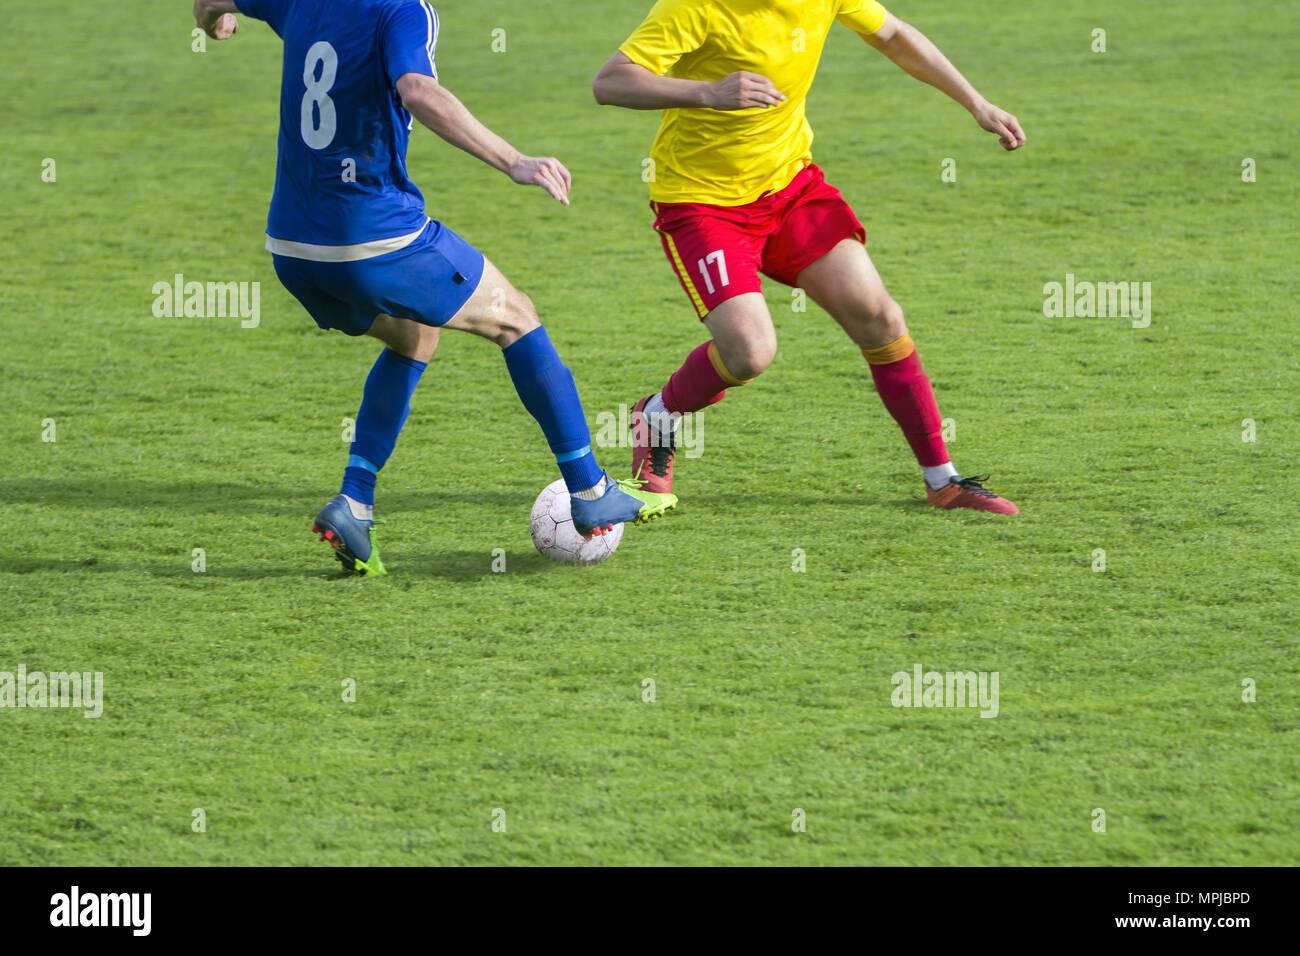 Football Soccer game Duel Drill Dribbling - Stock Image